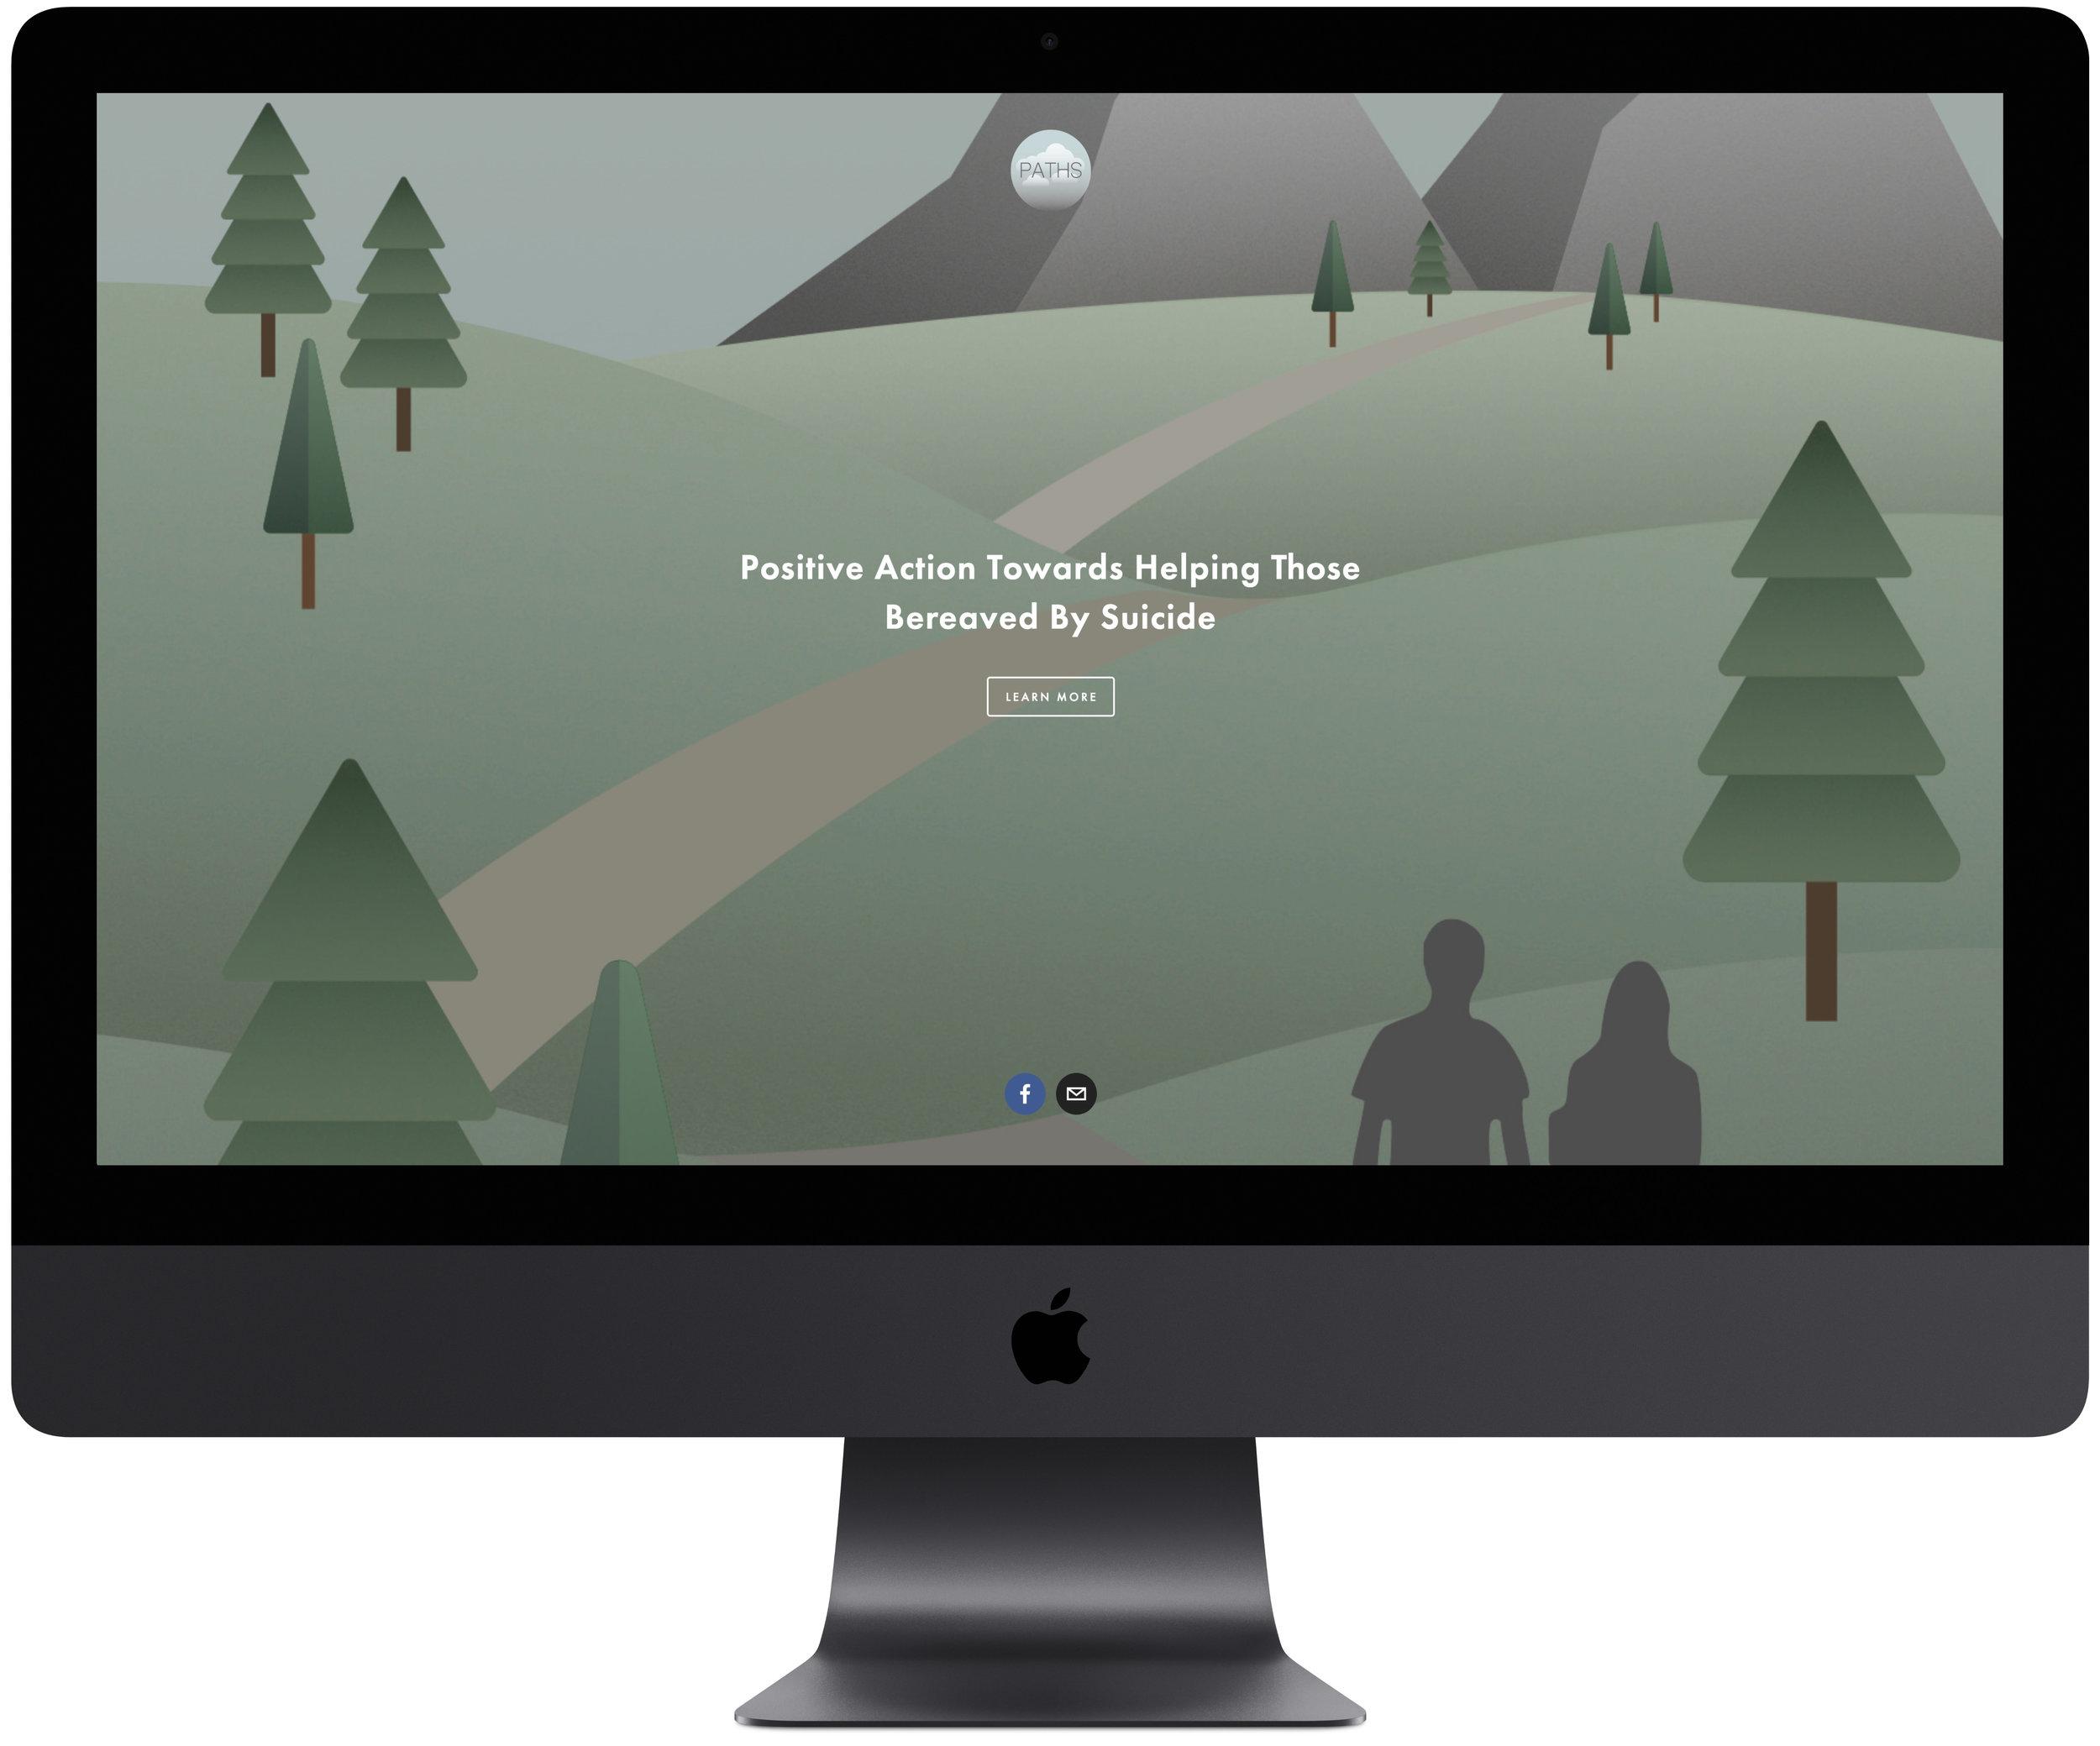 Paths Omagh - iMac.jpg